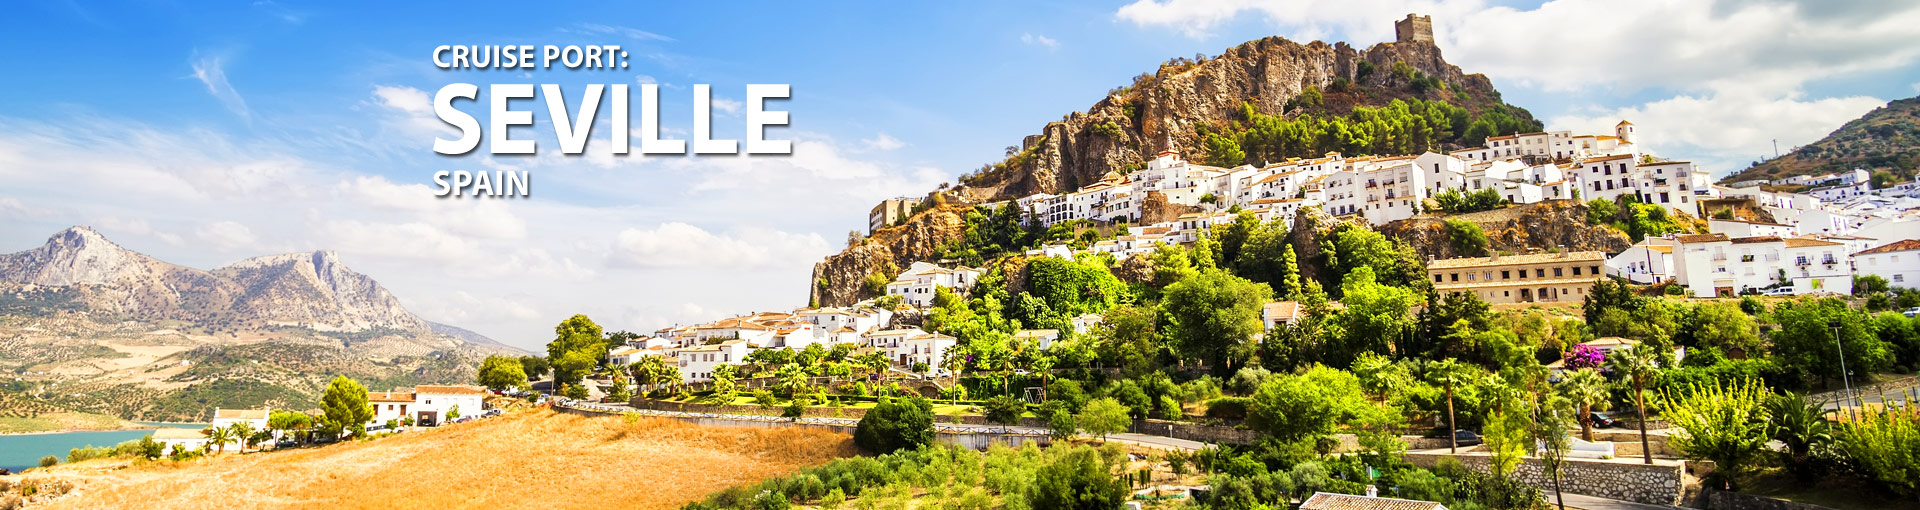 Cruises from Seville, Spain